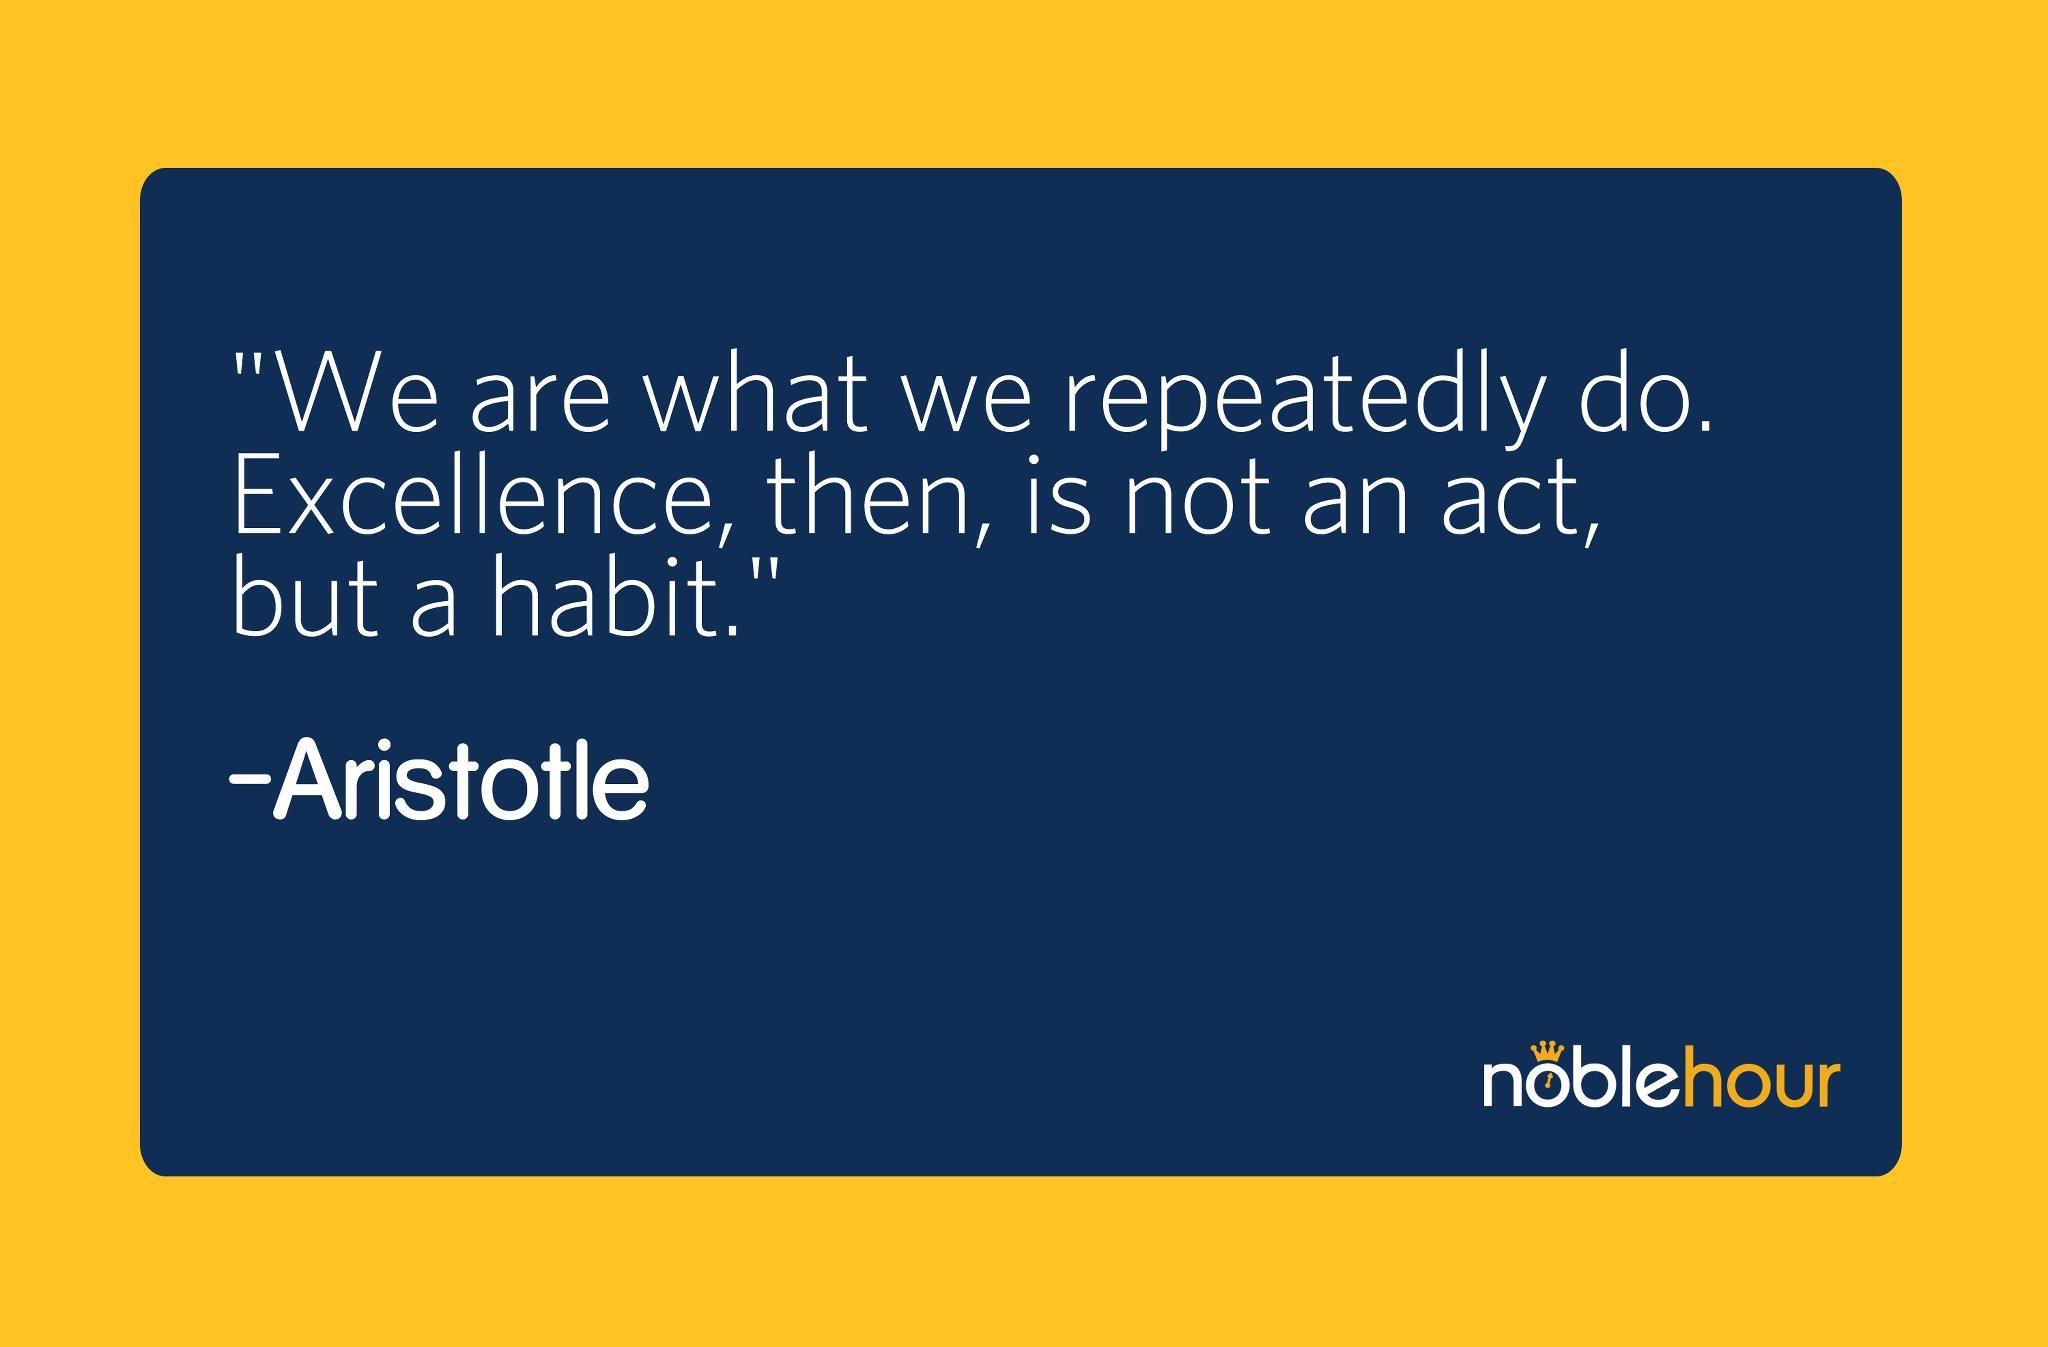 Repin if you make volunteering a habit!